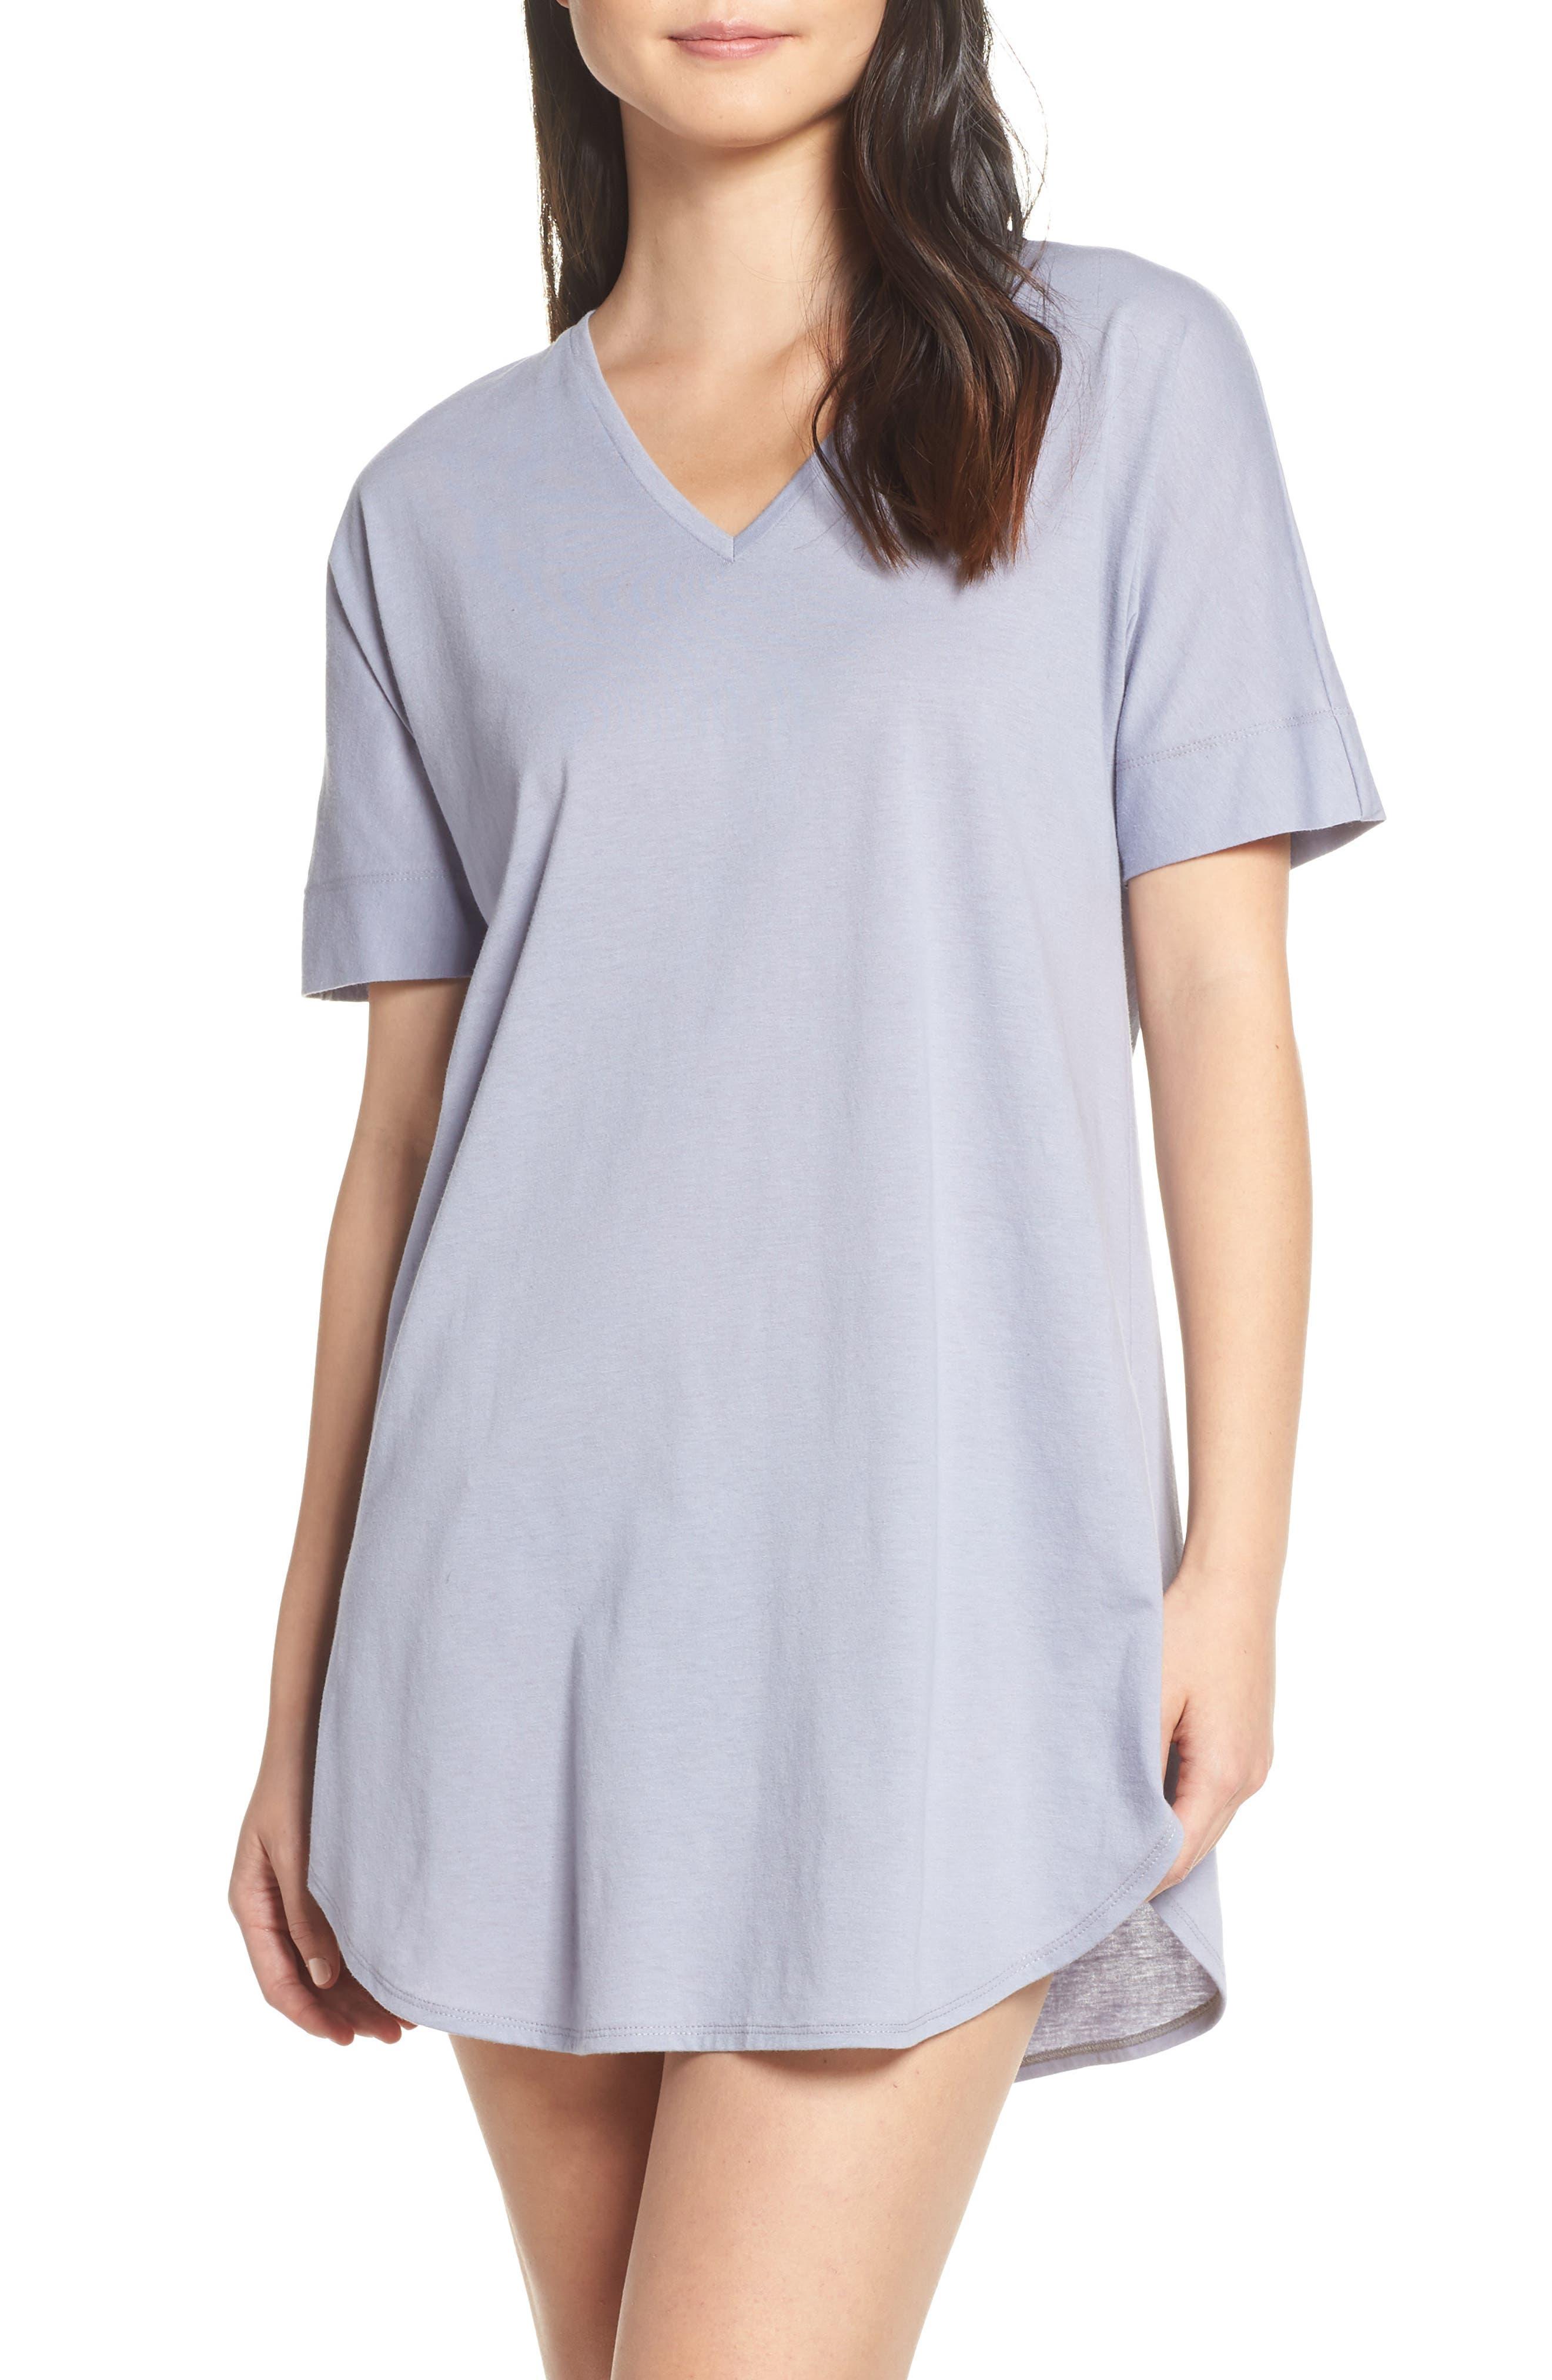 Natori V-Neck Sleep Shirt, Blue (Nordstrom Exclusive)